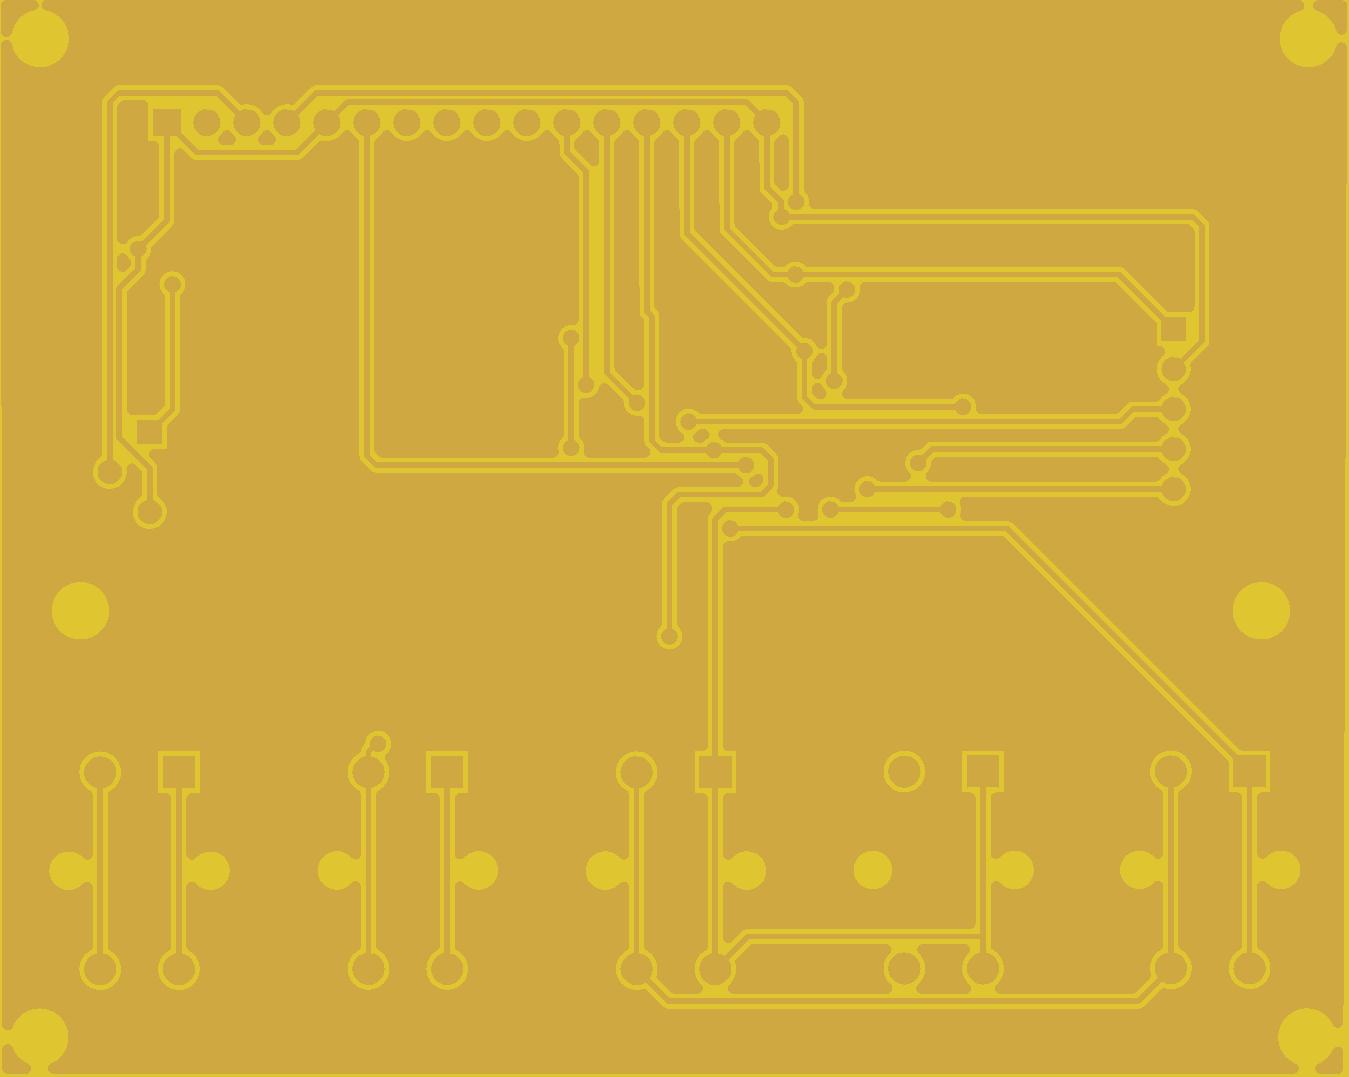 Power supply 22V 2,5A Atmega8 Control Board - Share Project